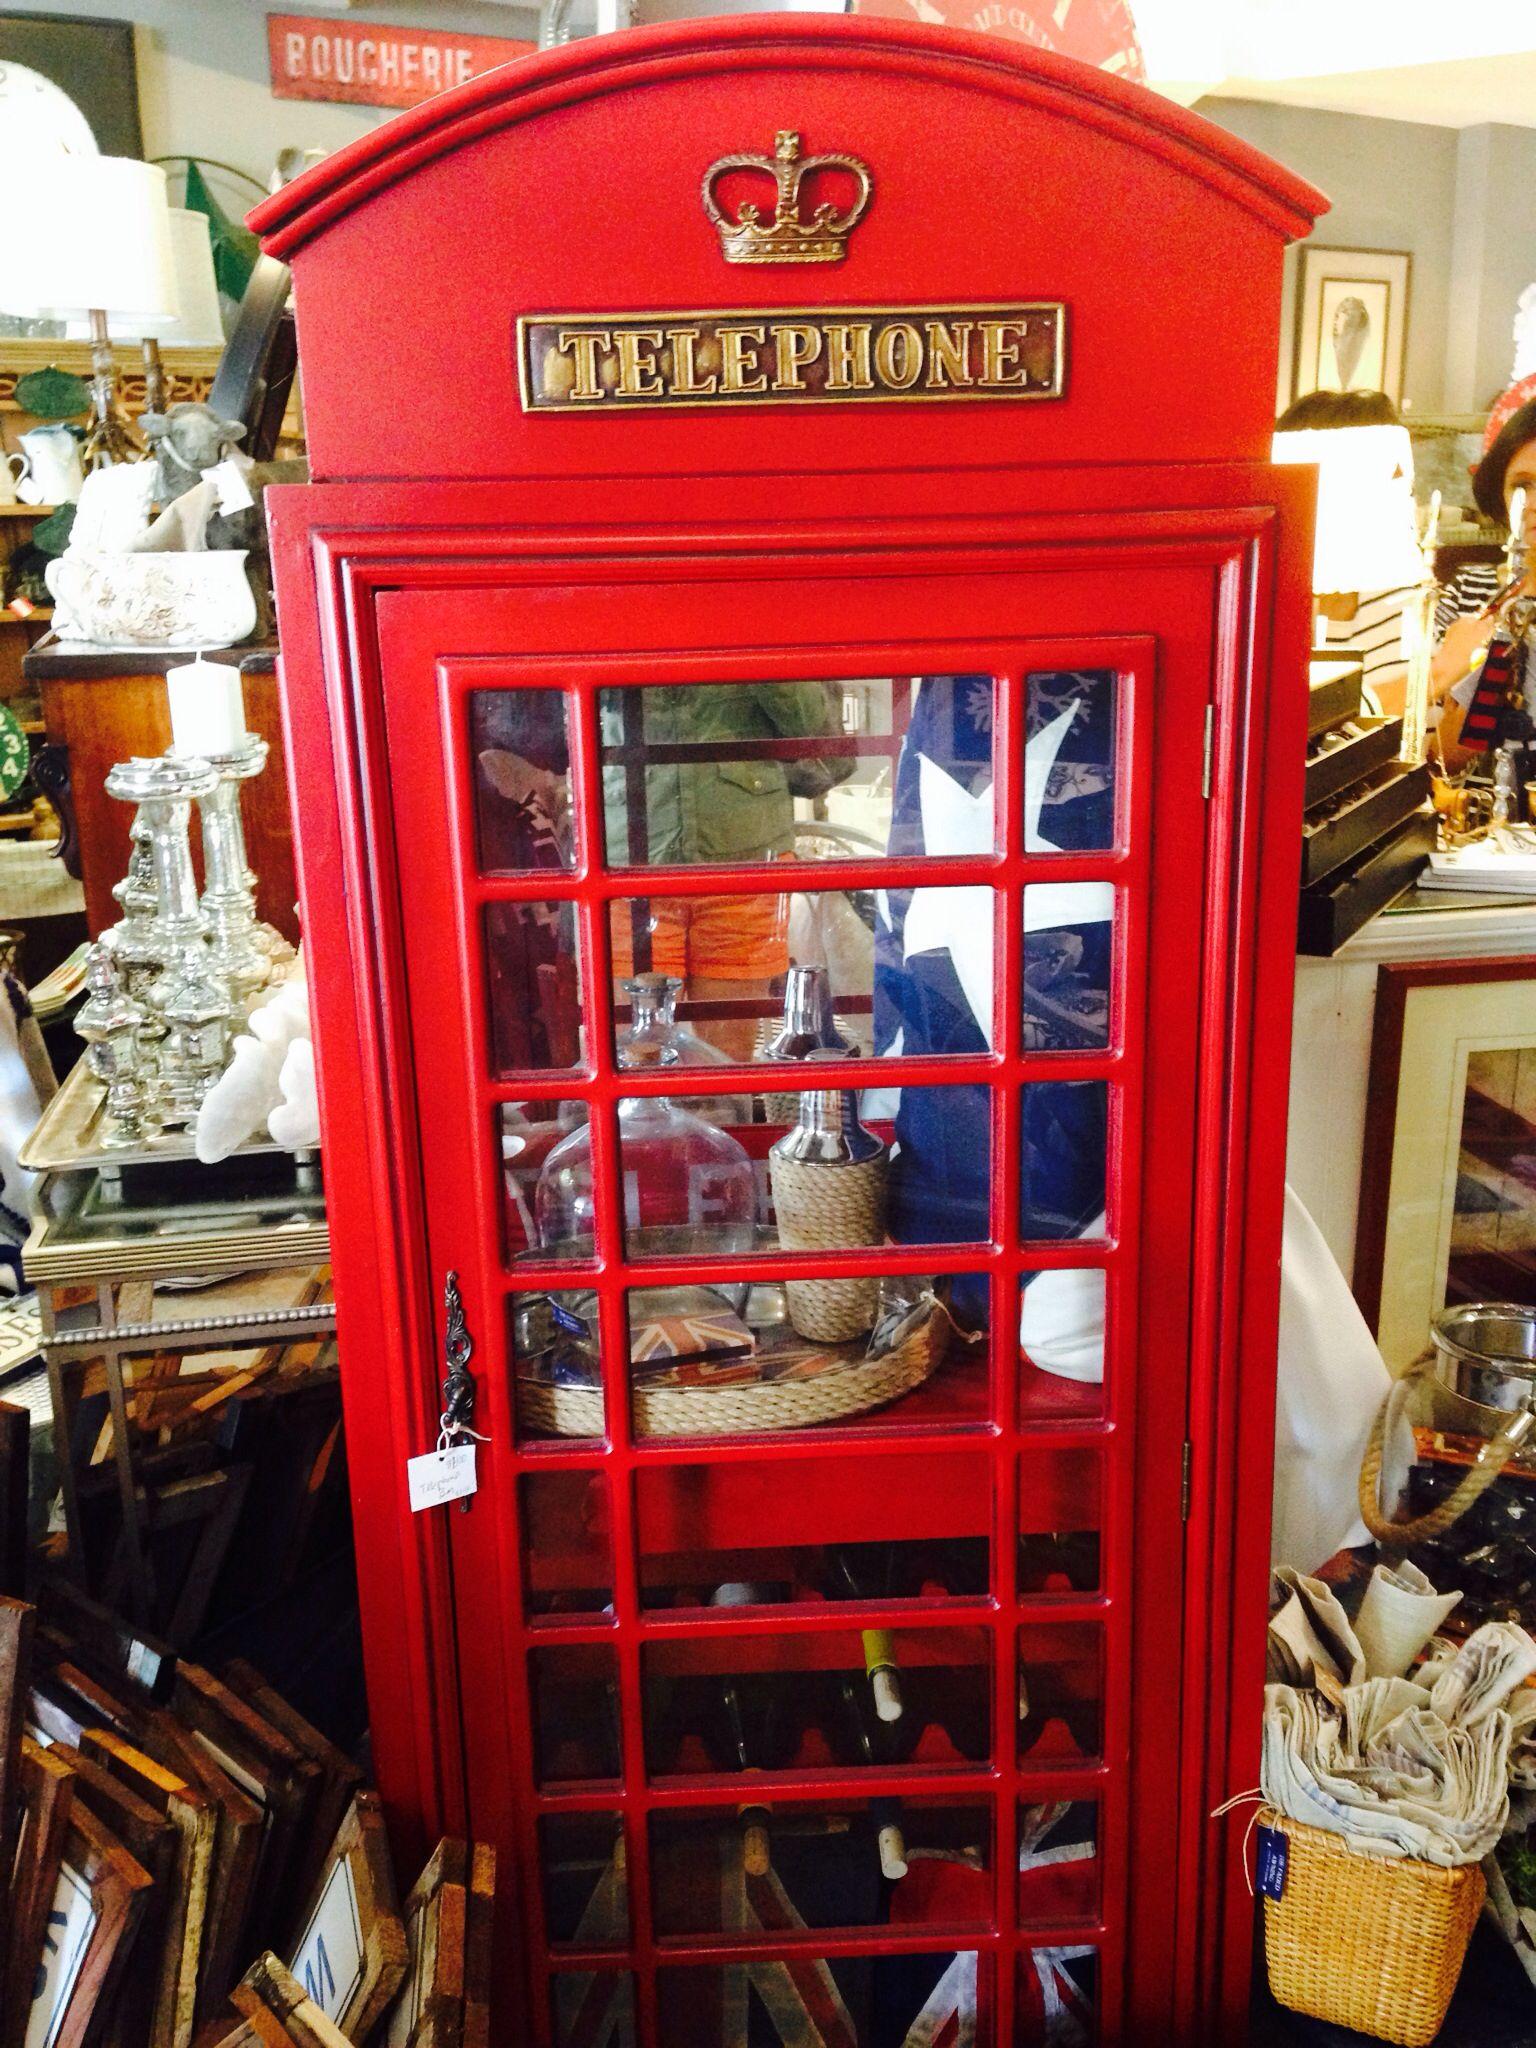 Telephone bar cabinet